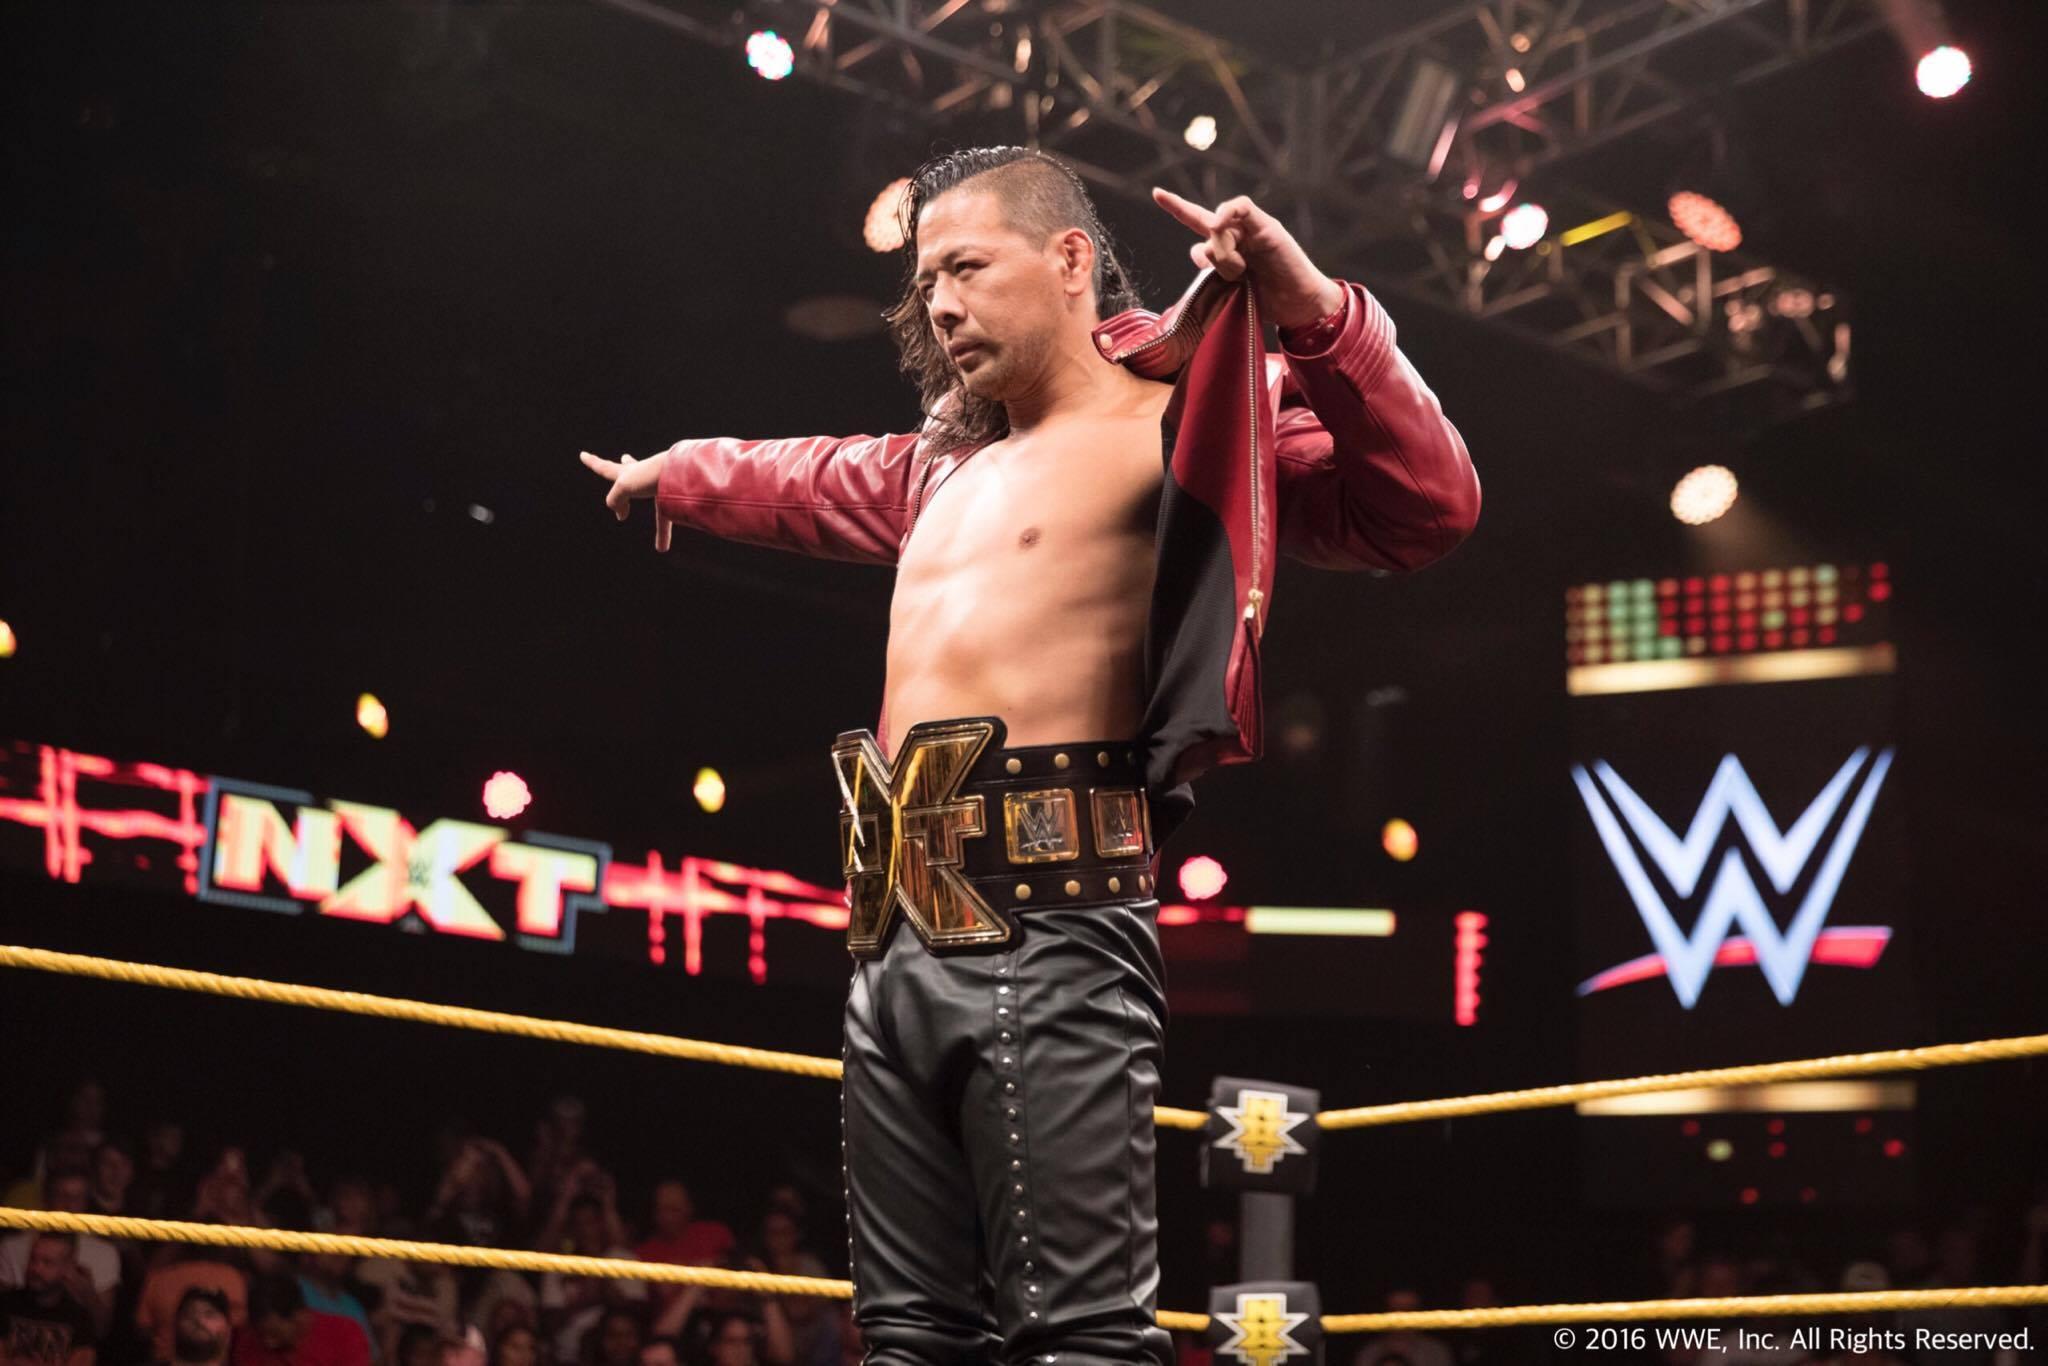 【WWE】2016年12月3日、ついにNXTが大阪に日本初上陸!「NXT Live Japan」開催決定!中邑真輔、ヒデオ・イタミ、アスカ参戦!